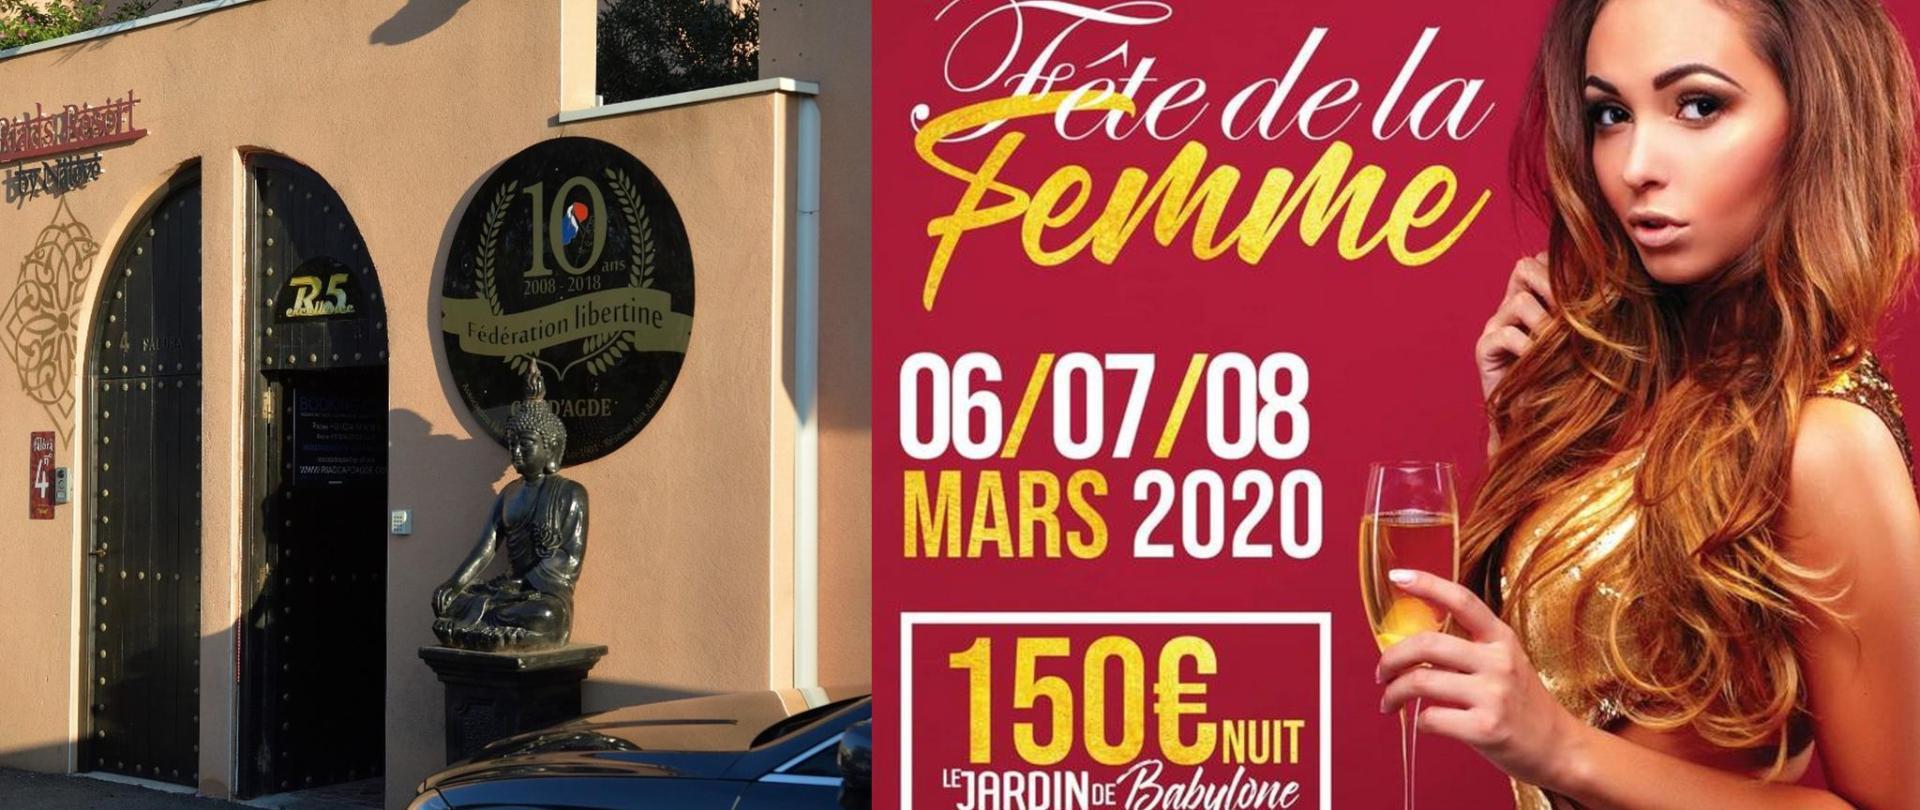 Fete de la Femme Double 2020.jpg